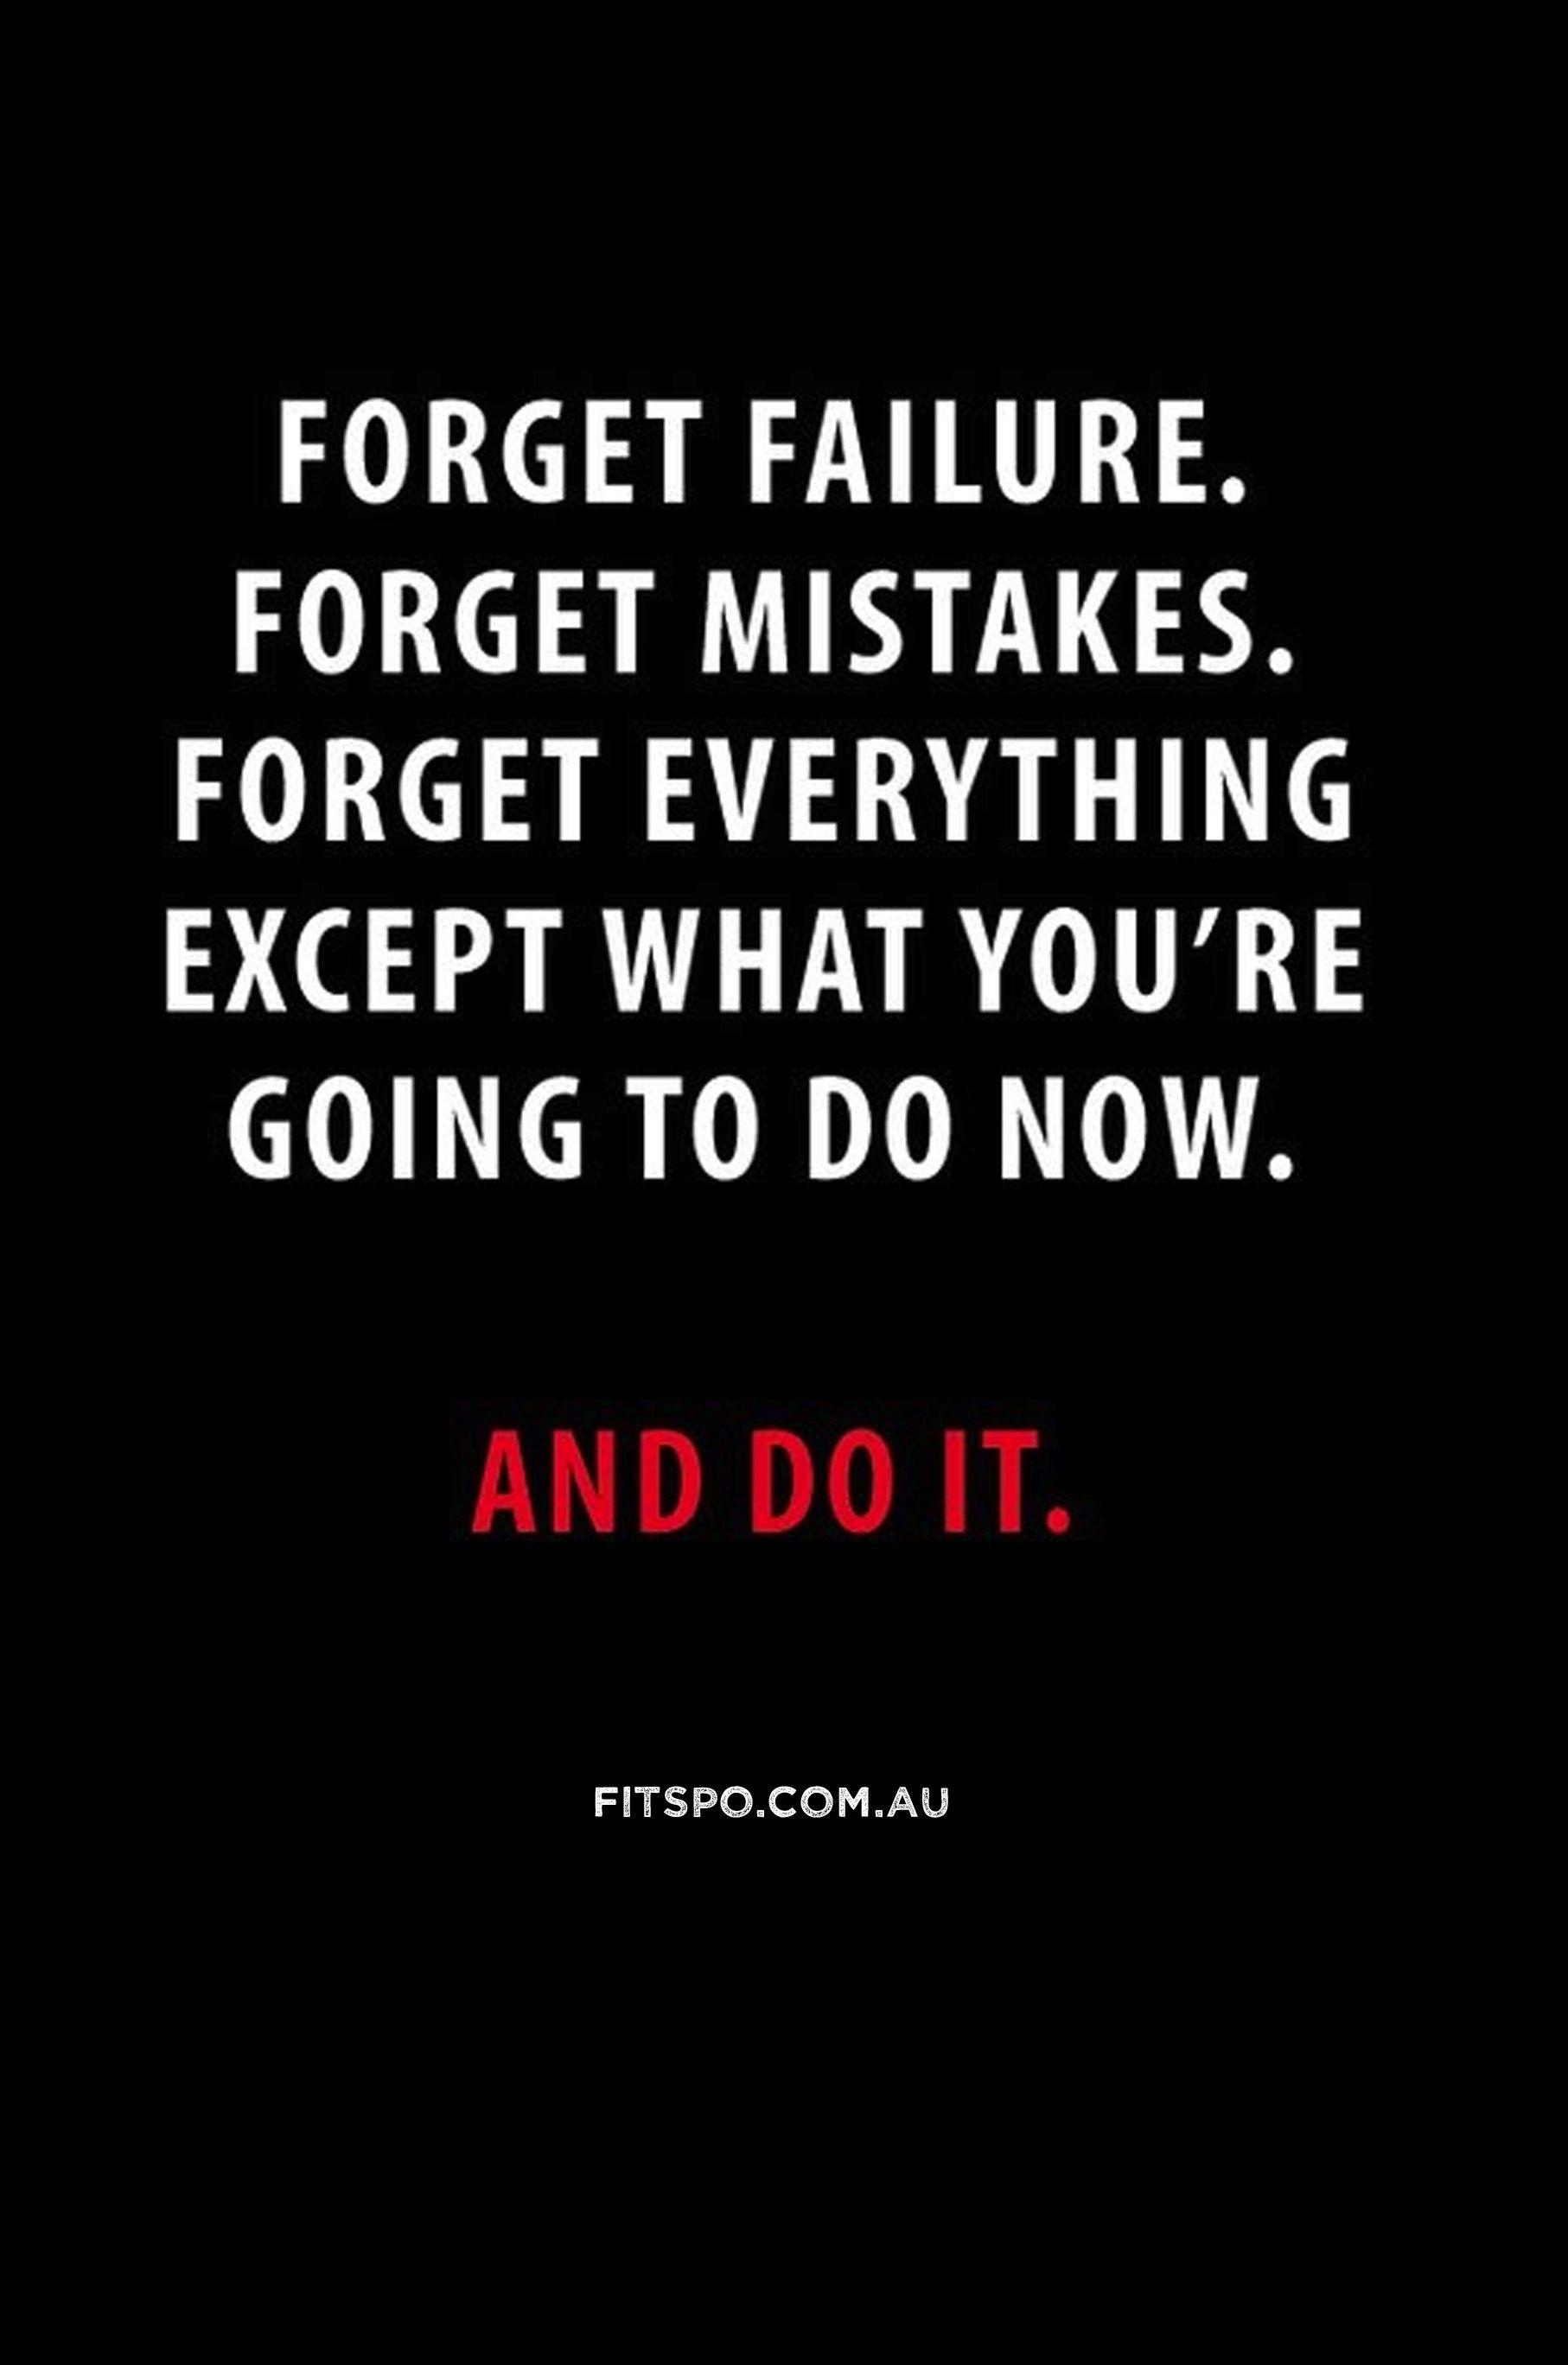 Iphone 4 Inspiration Wallpaper Fitness Motivation Fitness Motivation Wallpaper Fitness Quotes Fitness Motivation Quotes